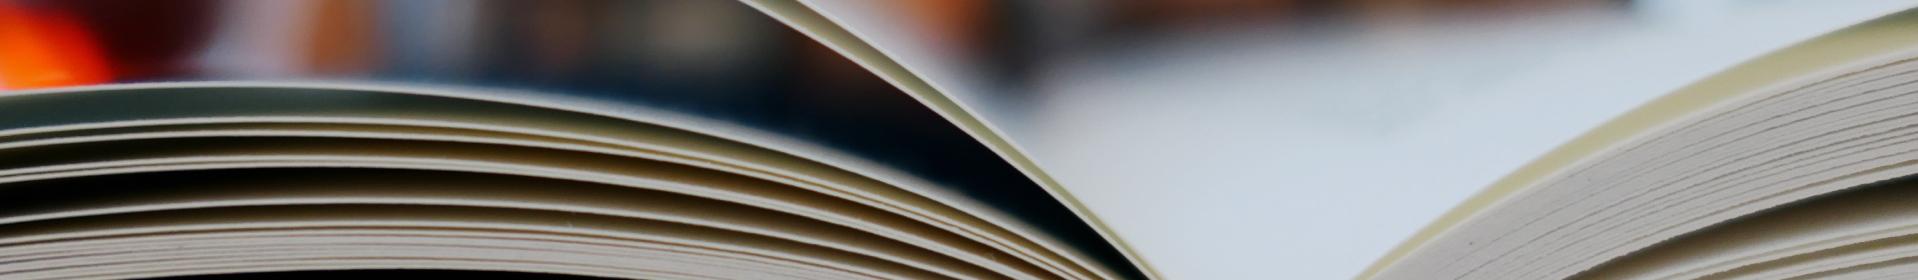 Progeo | Gruppo Editoriale Progeo